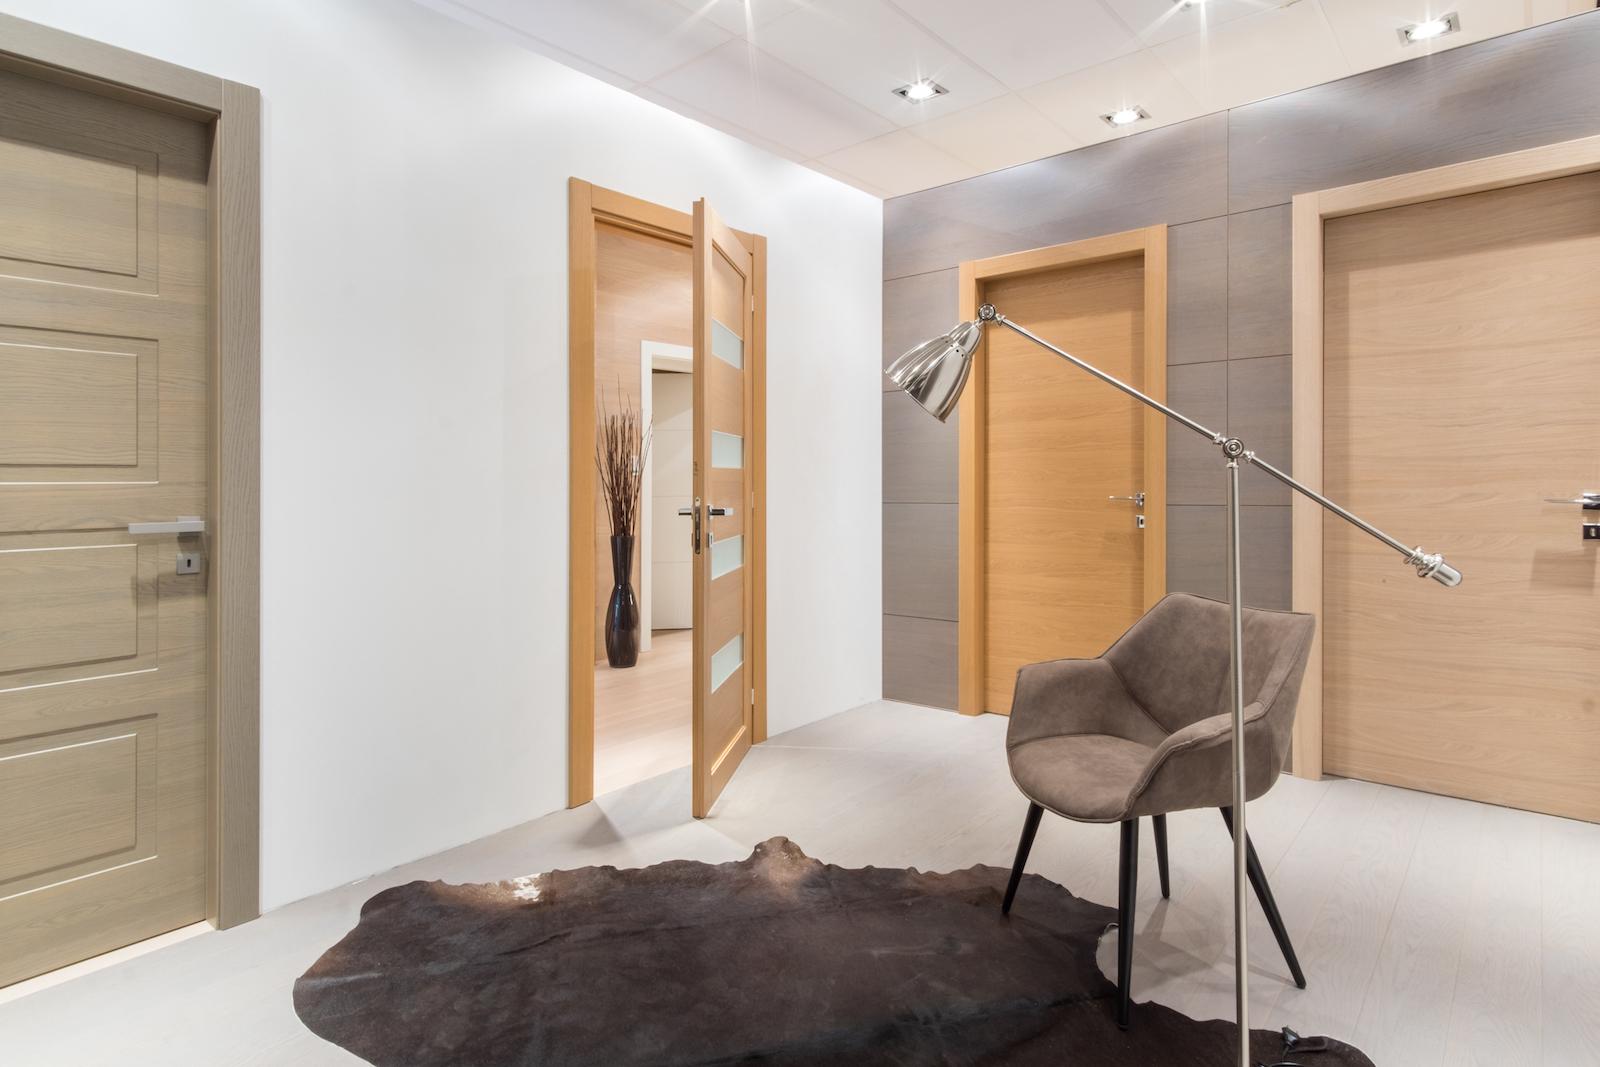 nouveau garofoli store bruxelles garofoli. Black Bedroom Furniture Sets. Home Design Ideas